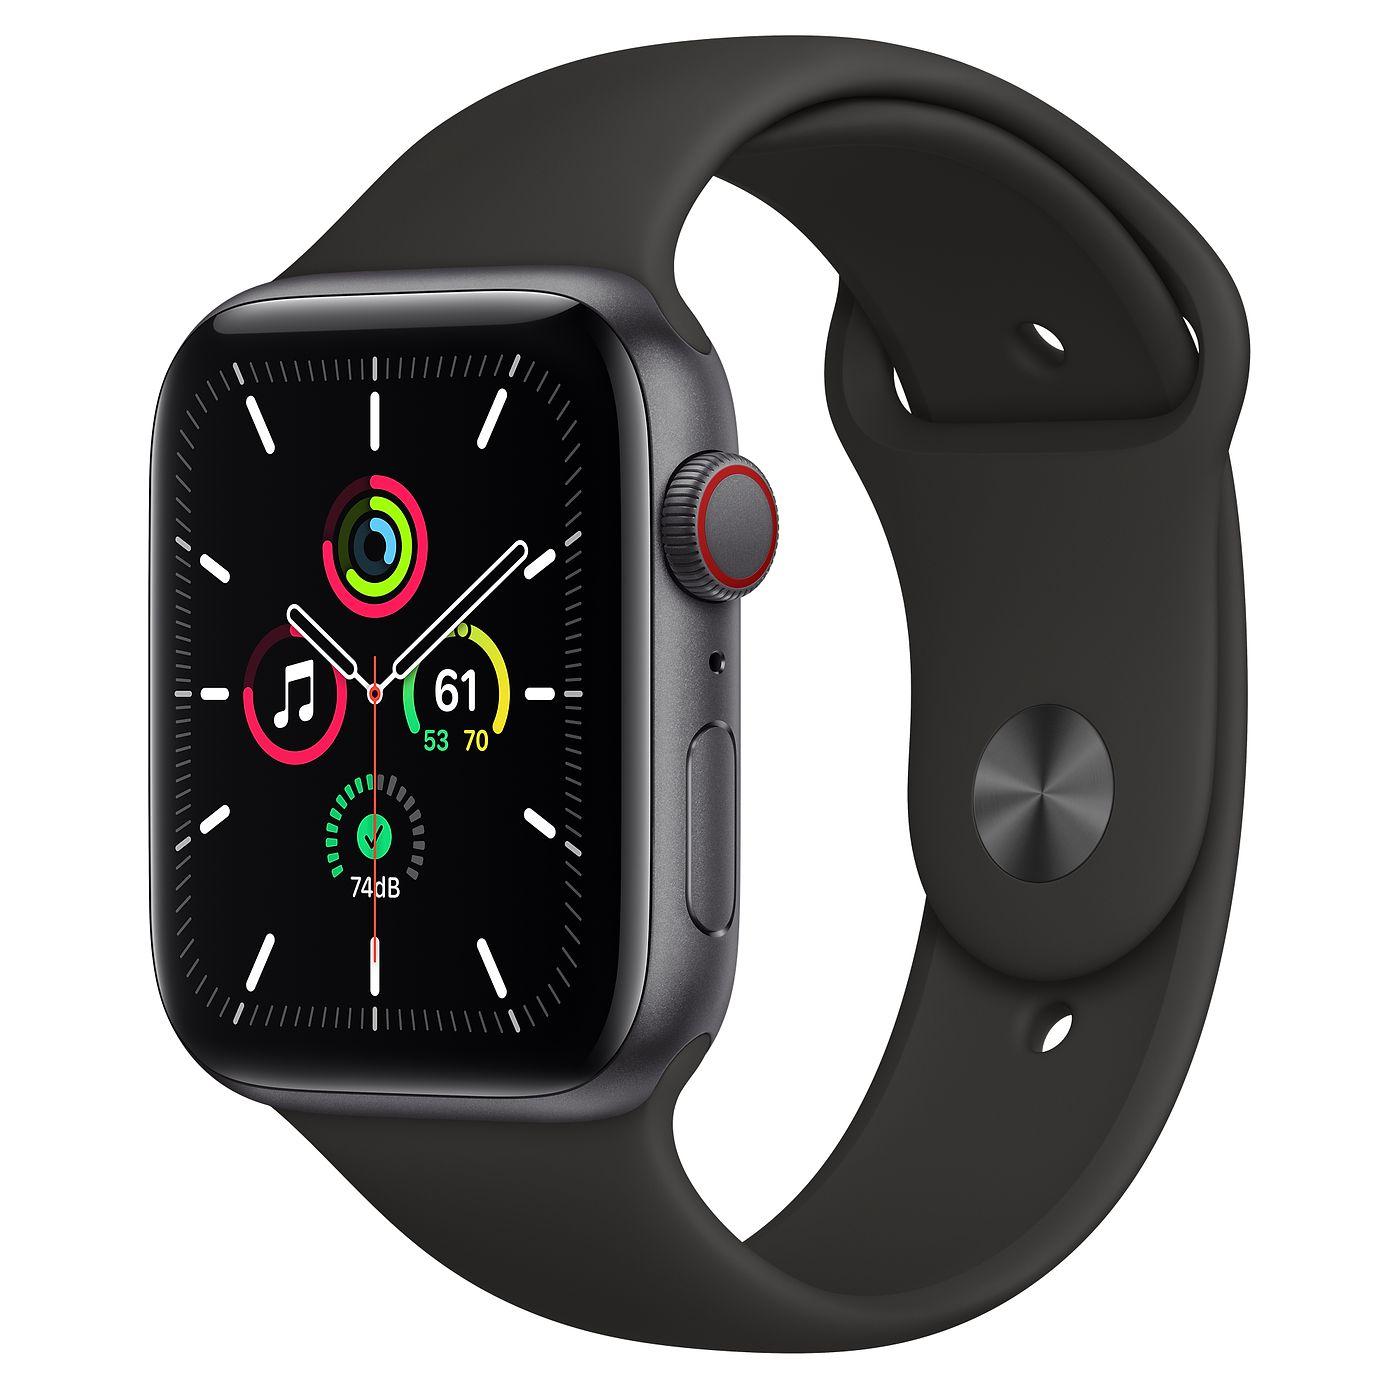 Apple 2020년 애플워치 SE GPS + 셀룰러 44mm 레귤러, 스페이스 그레이 알루미늄(케이스), 블랙(스포츠 밴드)